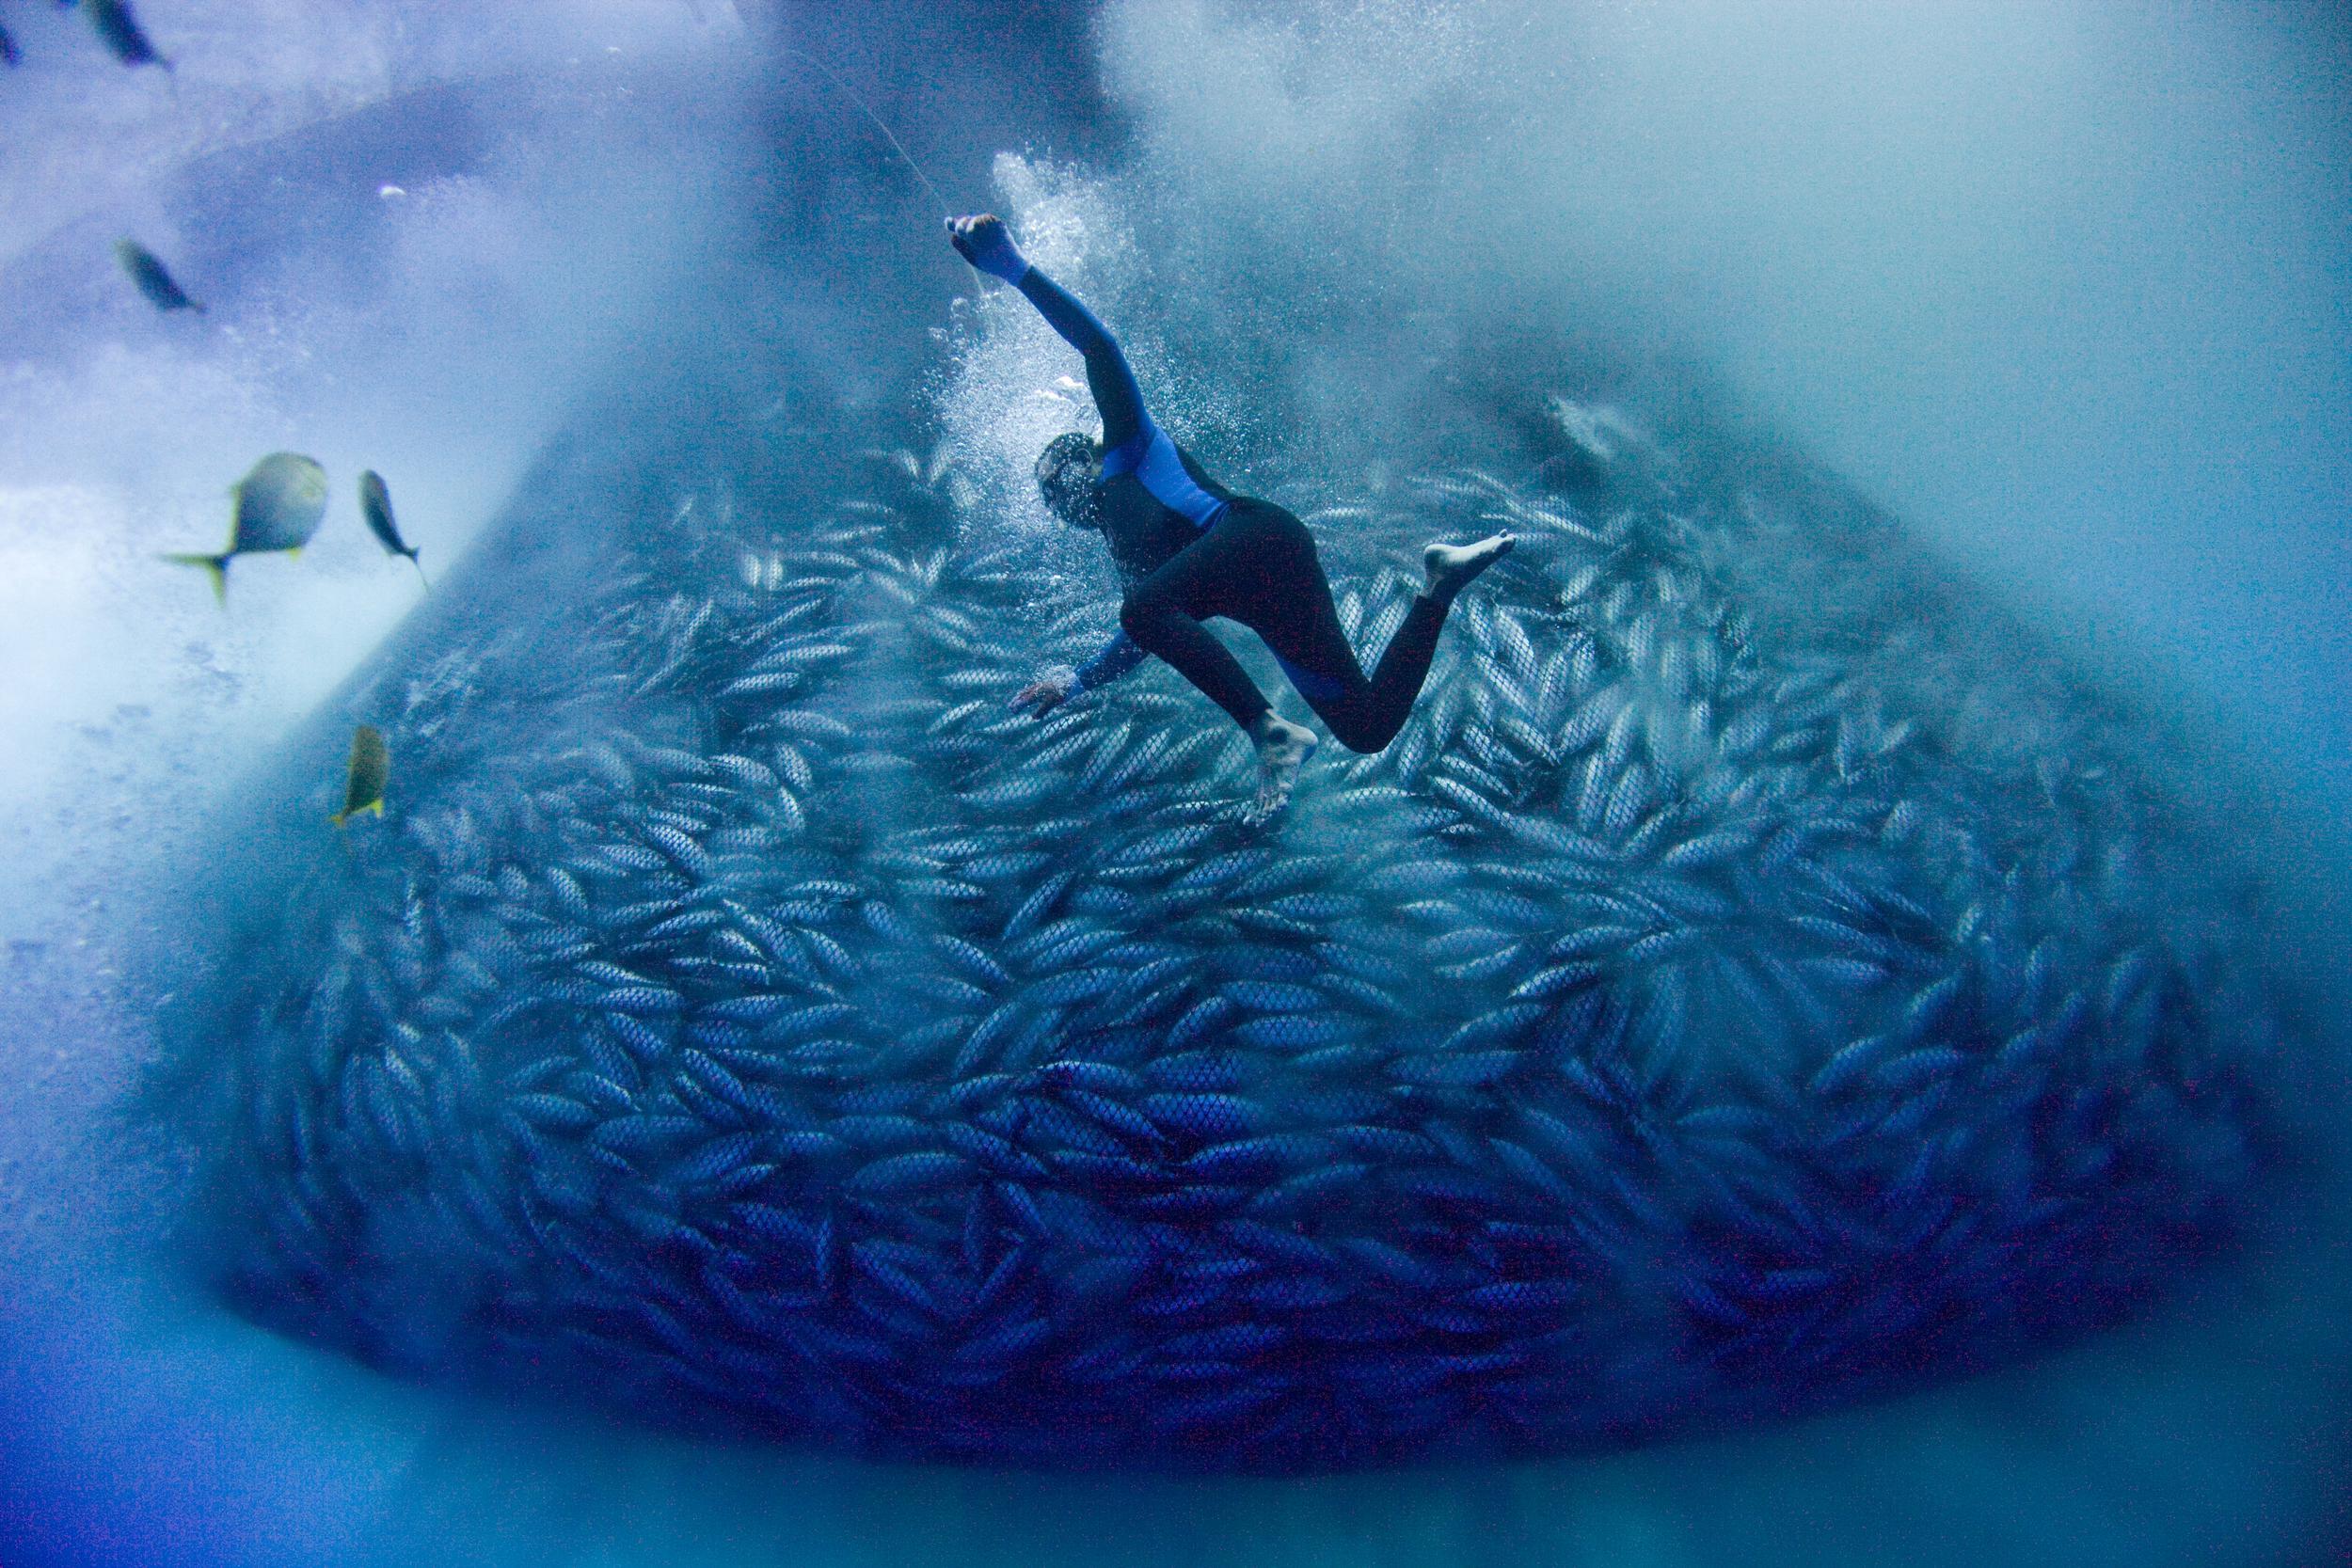 Photo by Alex Hofford / Greenpeace